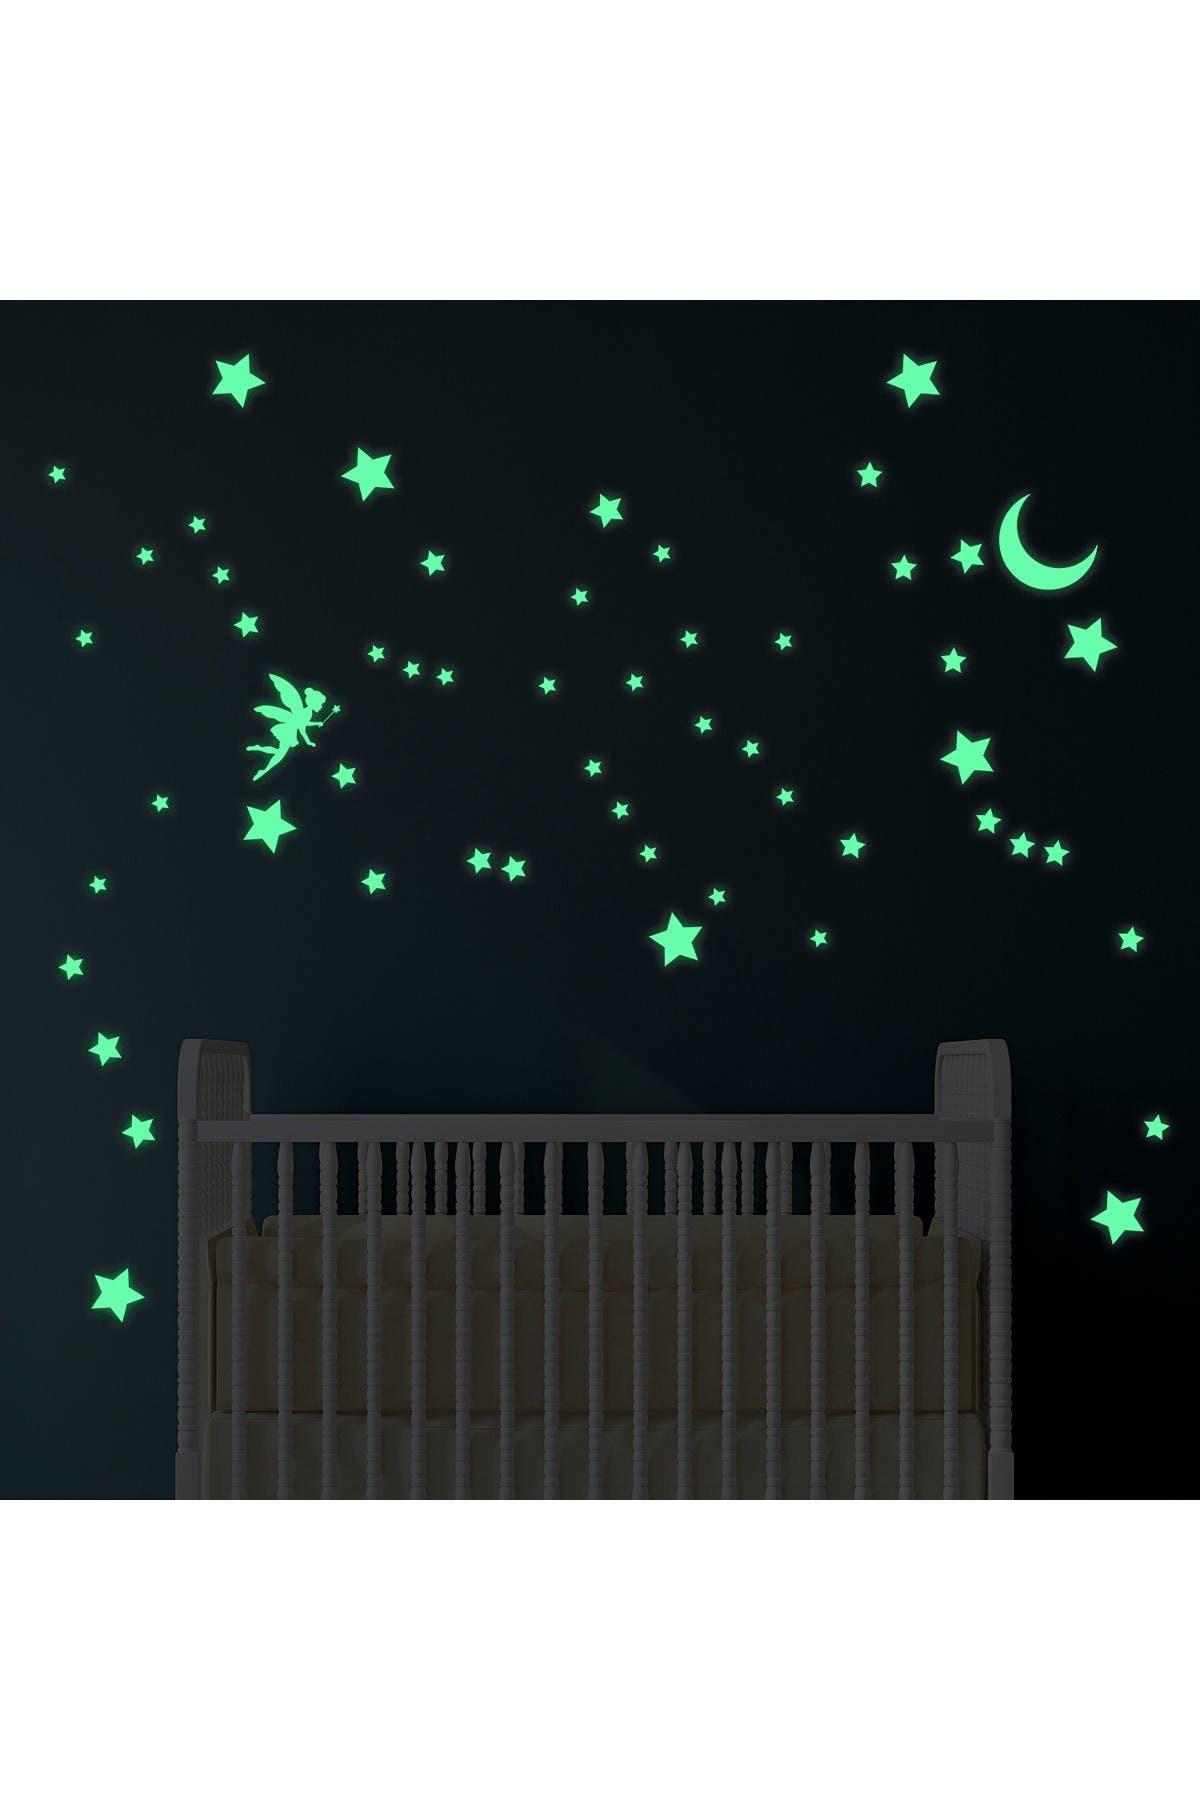 Image of WalPlus Glow in Dark Magic Night Wall Sticker Art